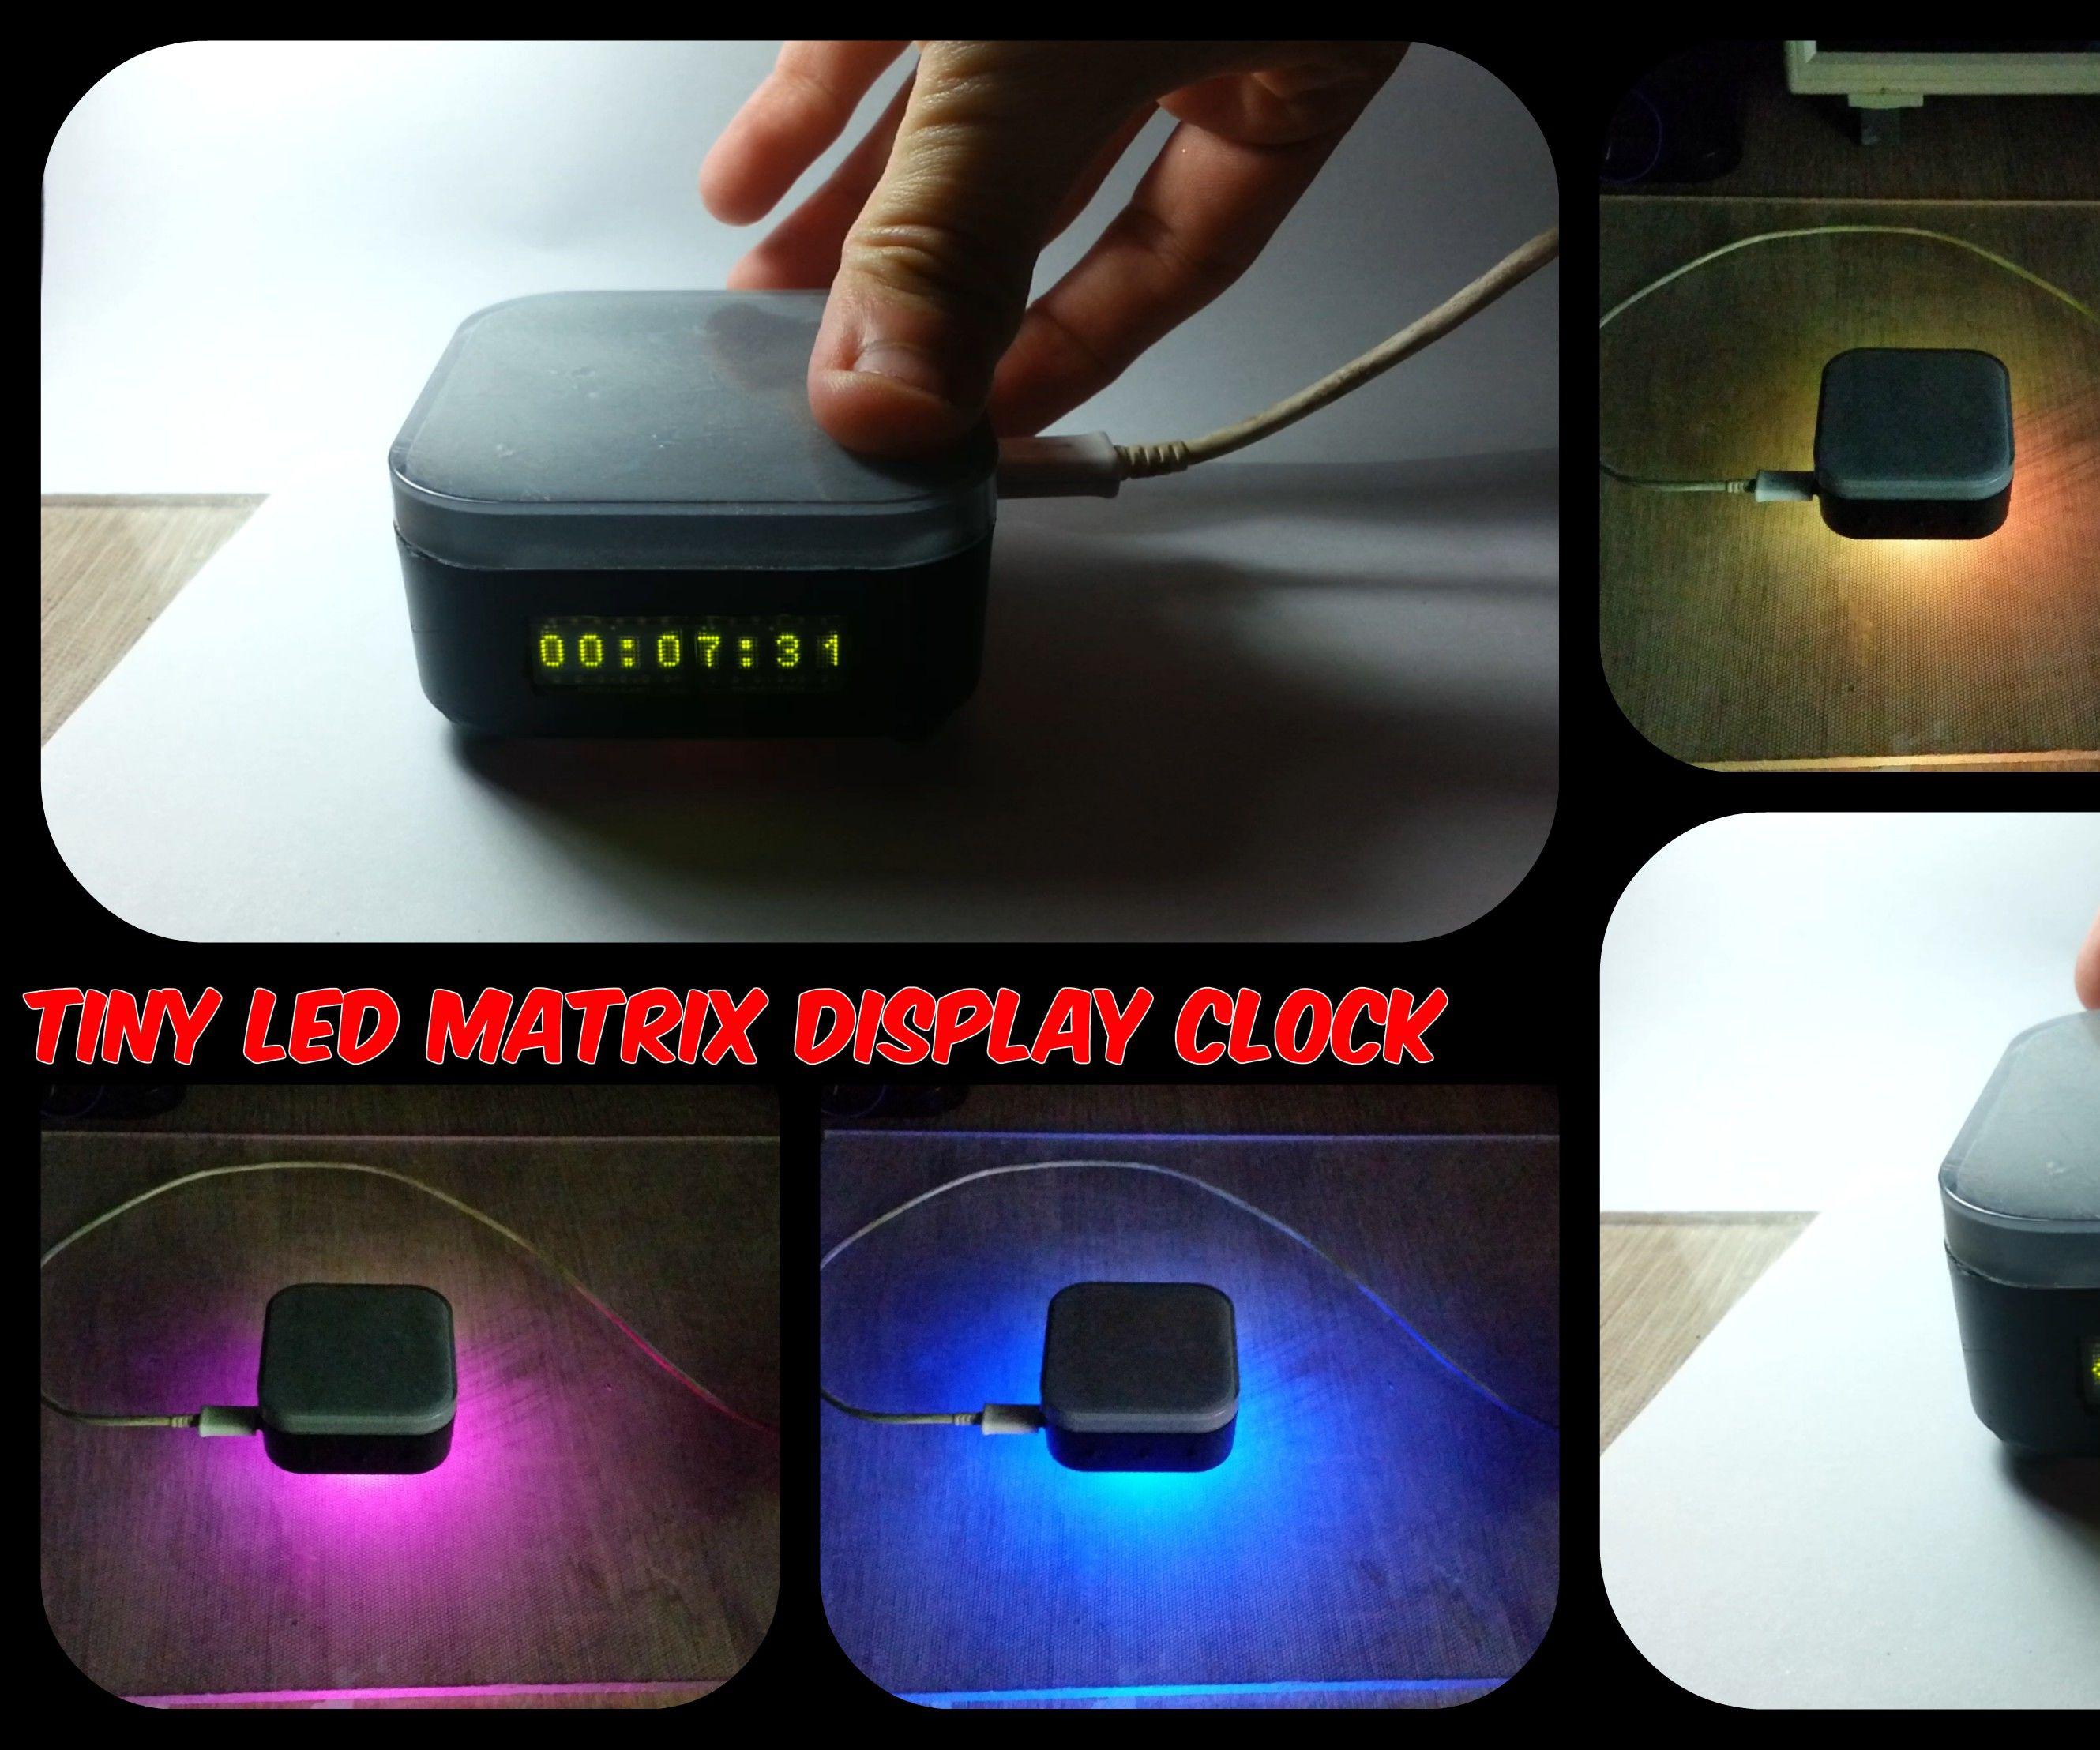 Tiny LED Matrix Display Clock: 8 Steps